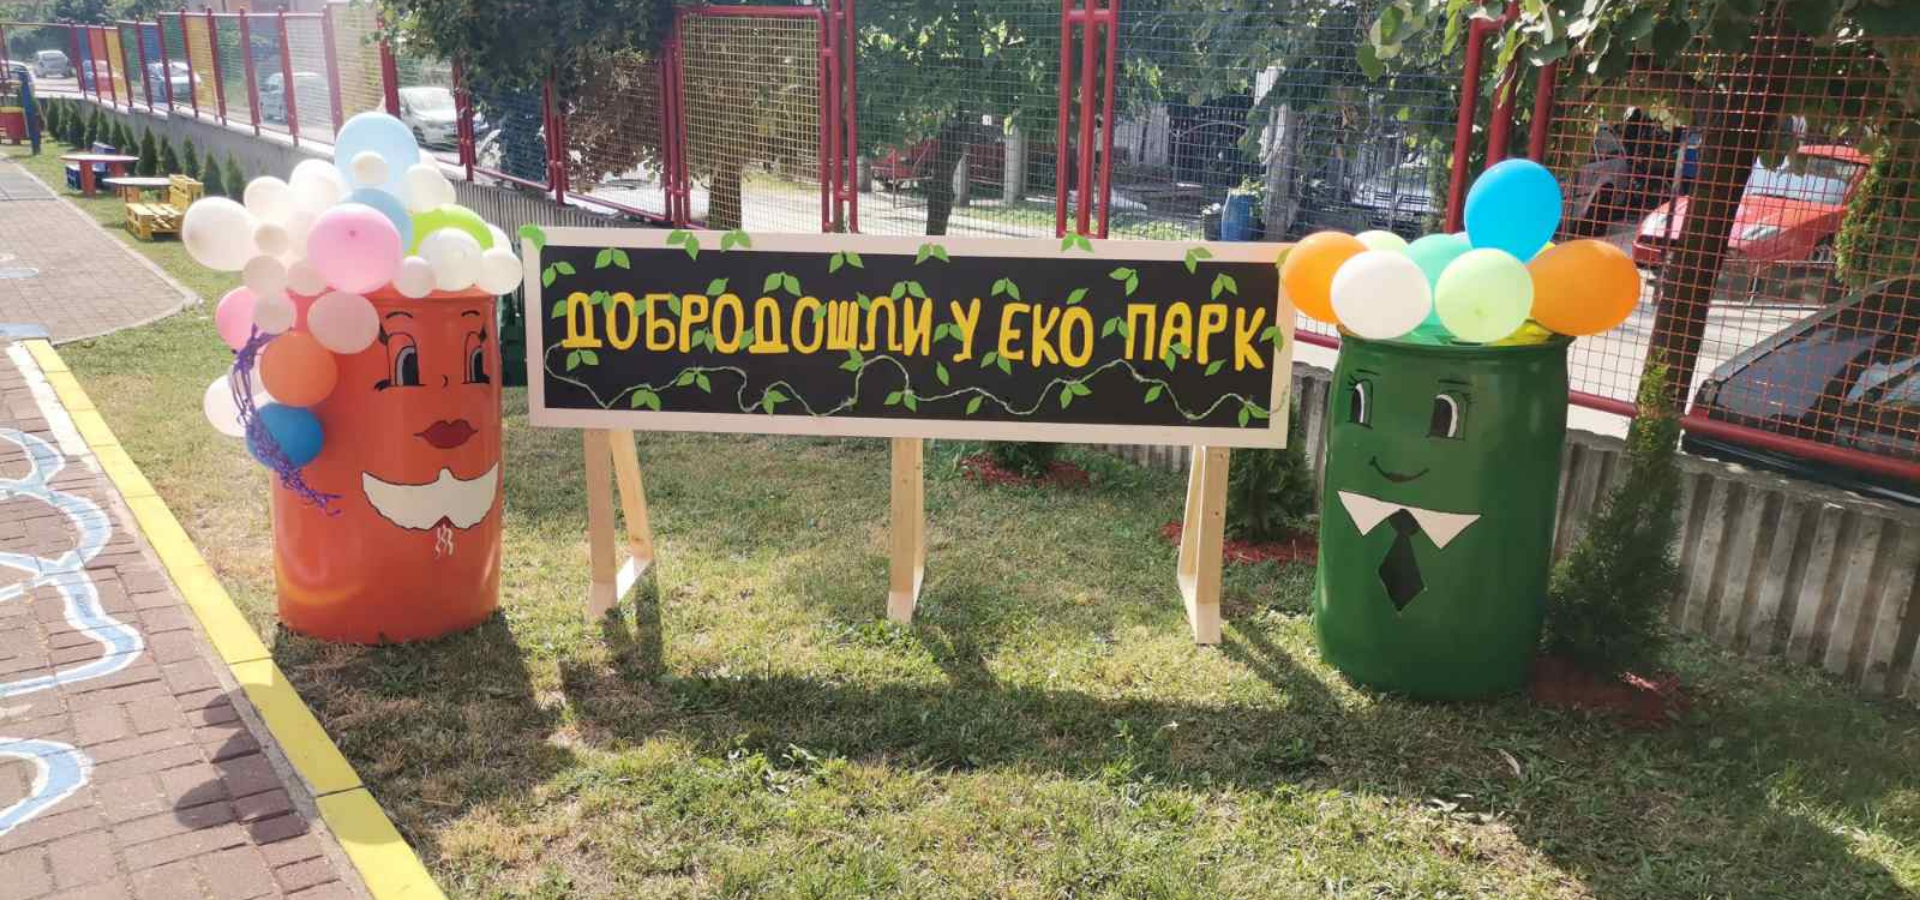 Otvoren prvi eko park u Vranju